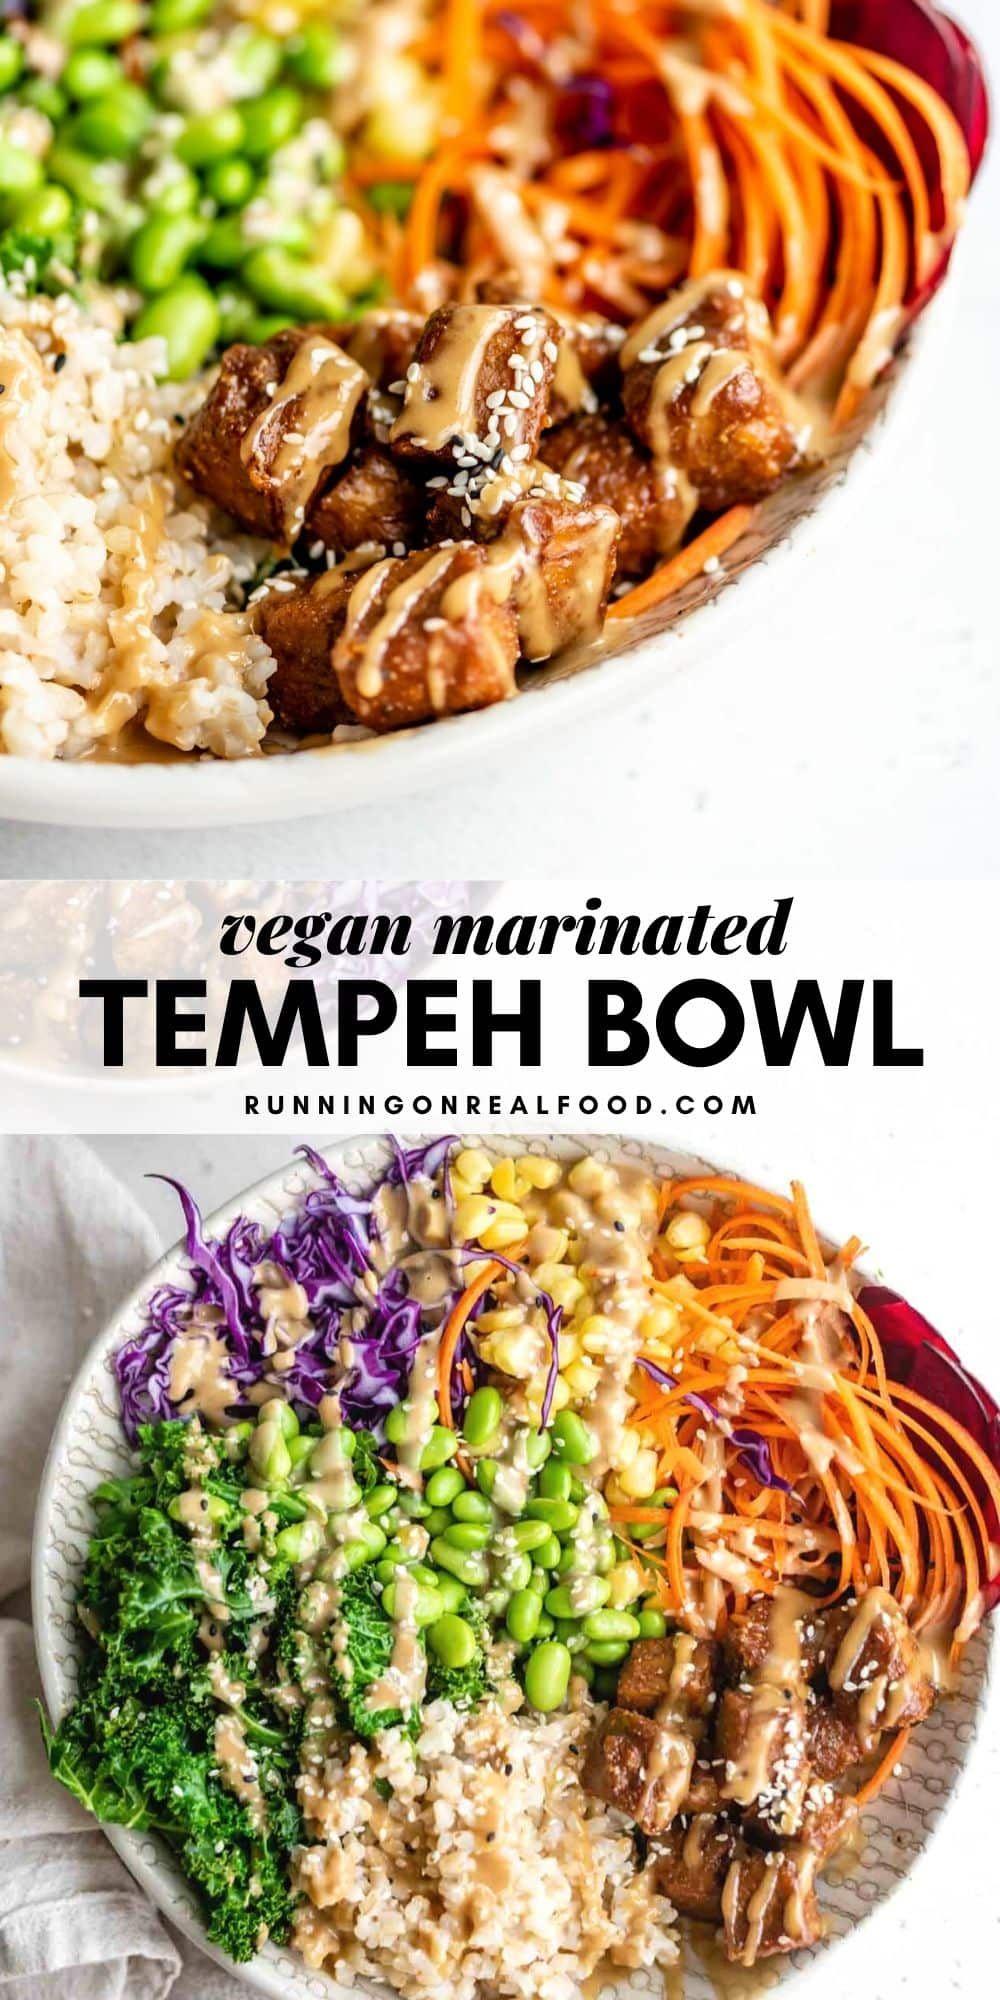 Photo of Vegan Marinated Tempeh Bowl